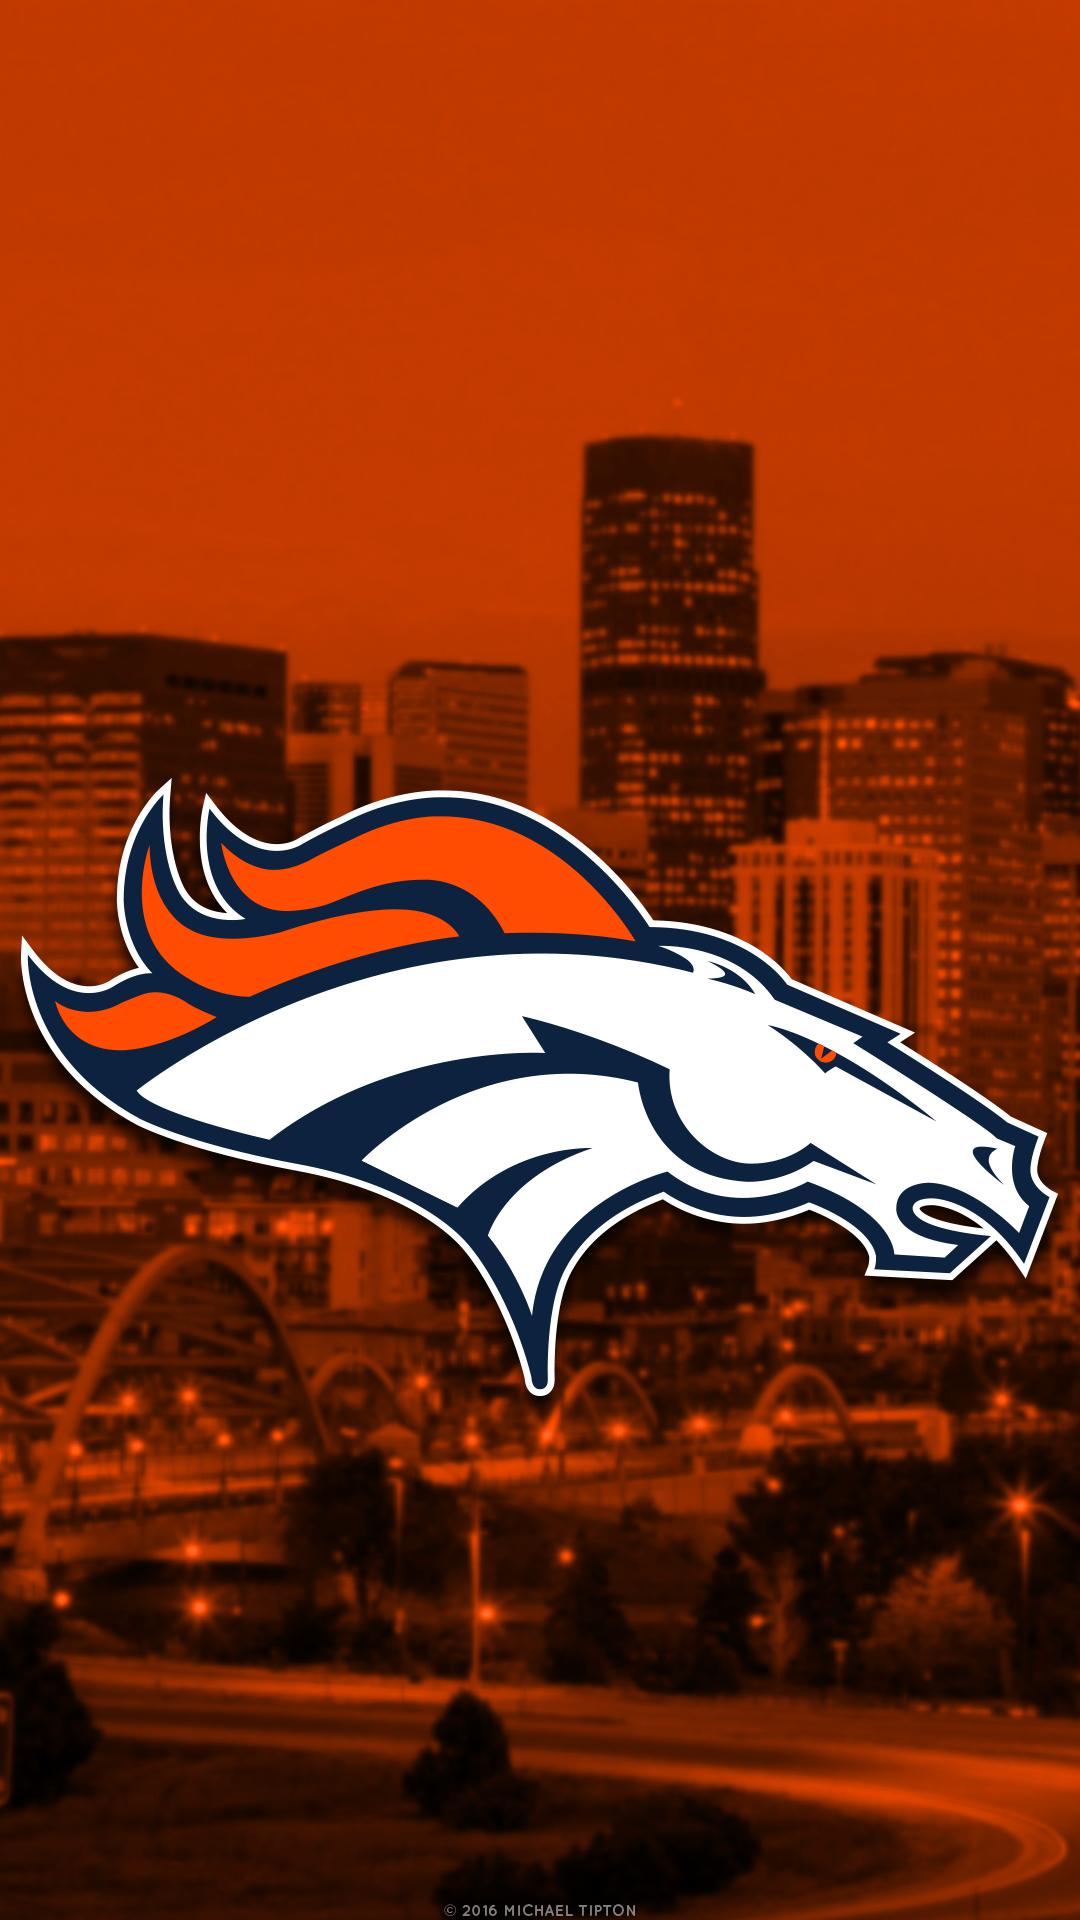 Denver Broncos Wallpaper For Android 2020 Live Wallpaper Hd Denver Broncos Wallpaper Broncos Wallpaper Denver Broncos